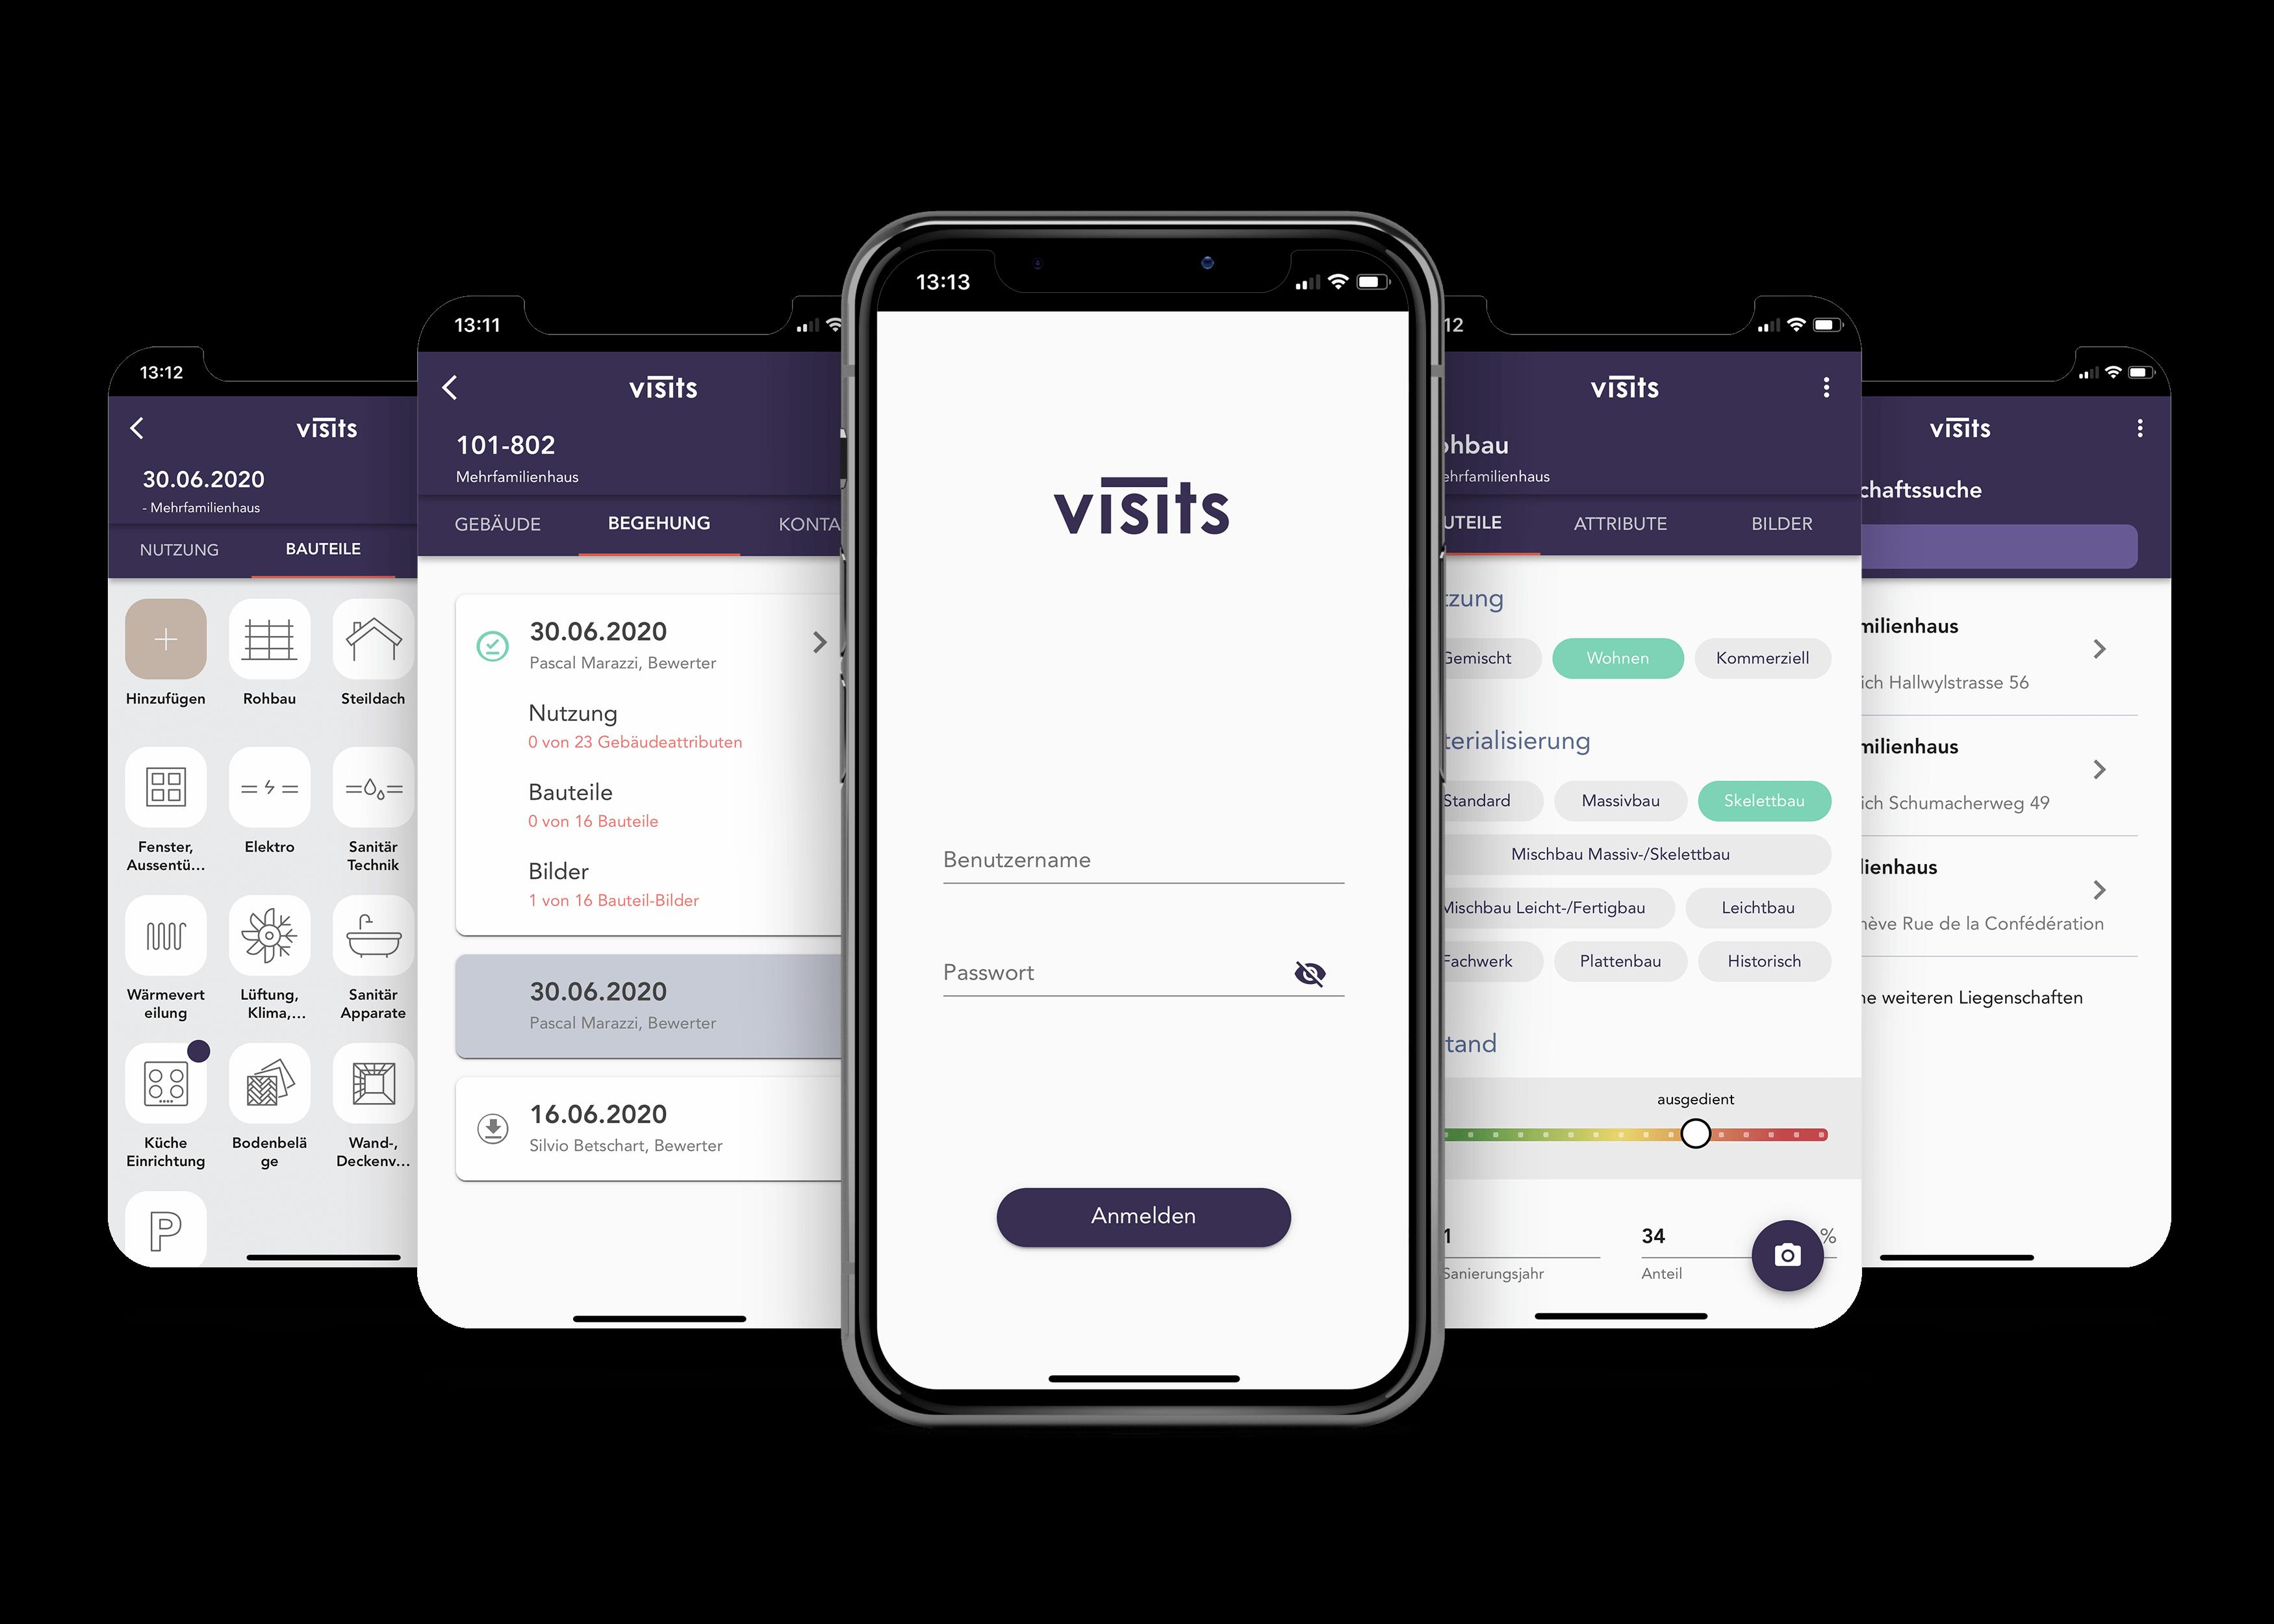 screenshots of the visit app